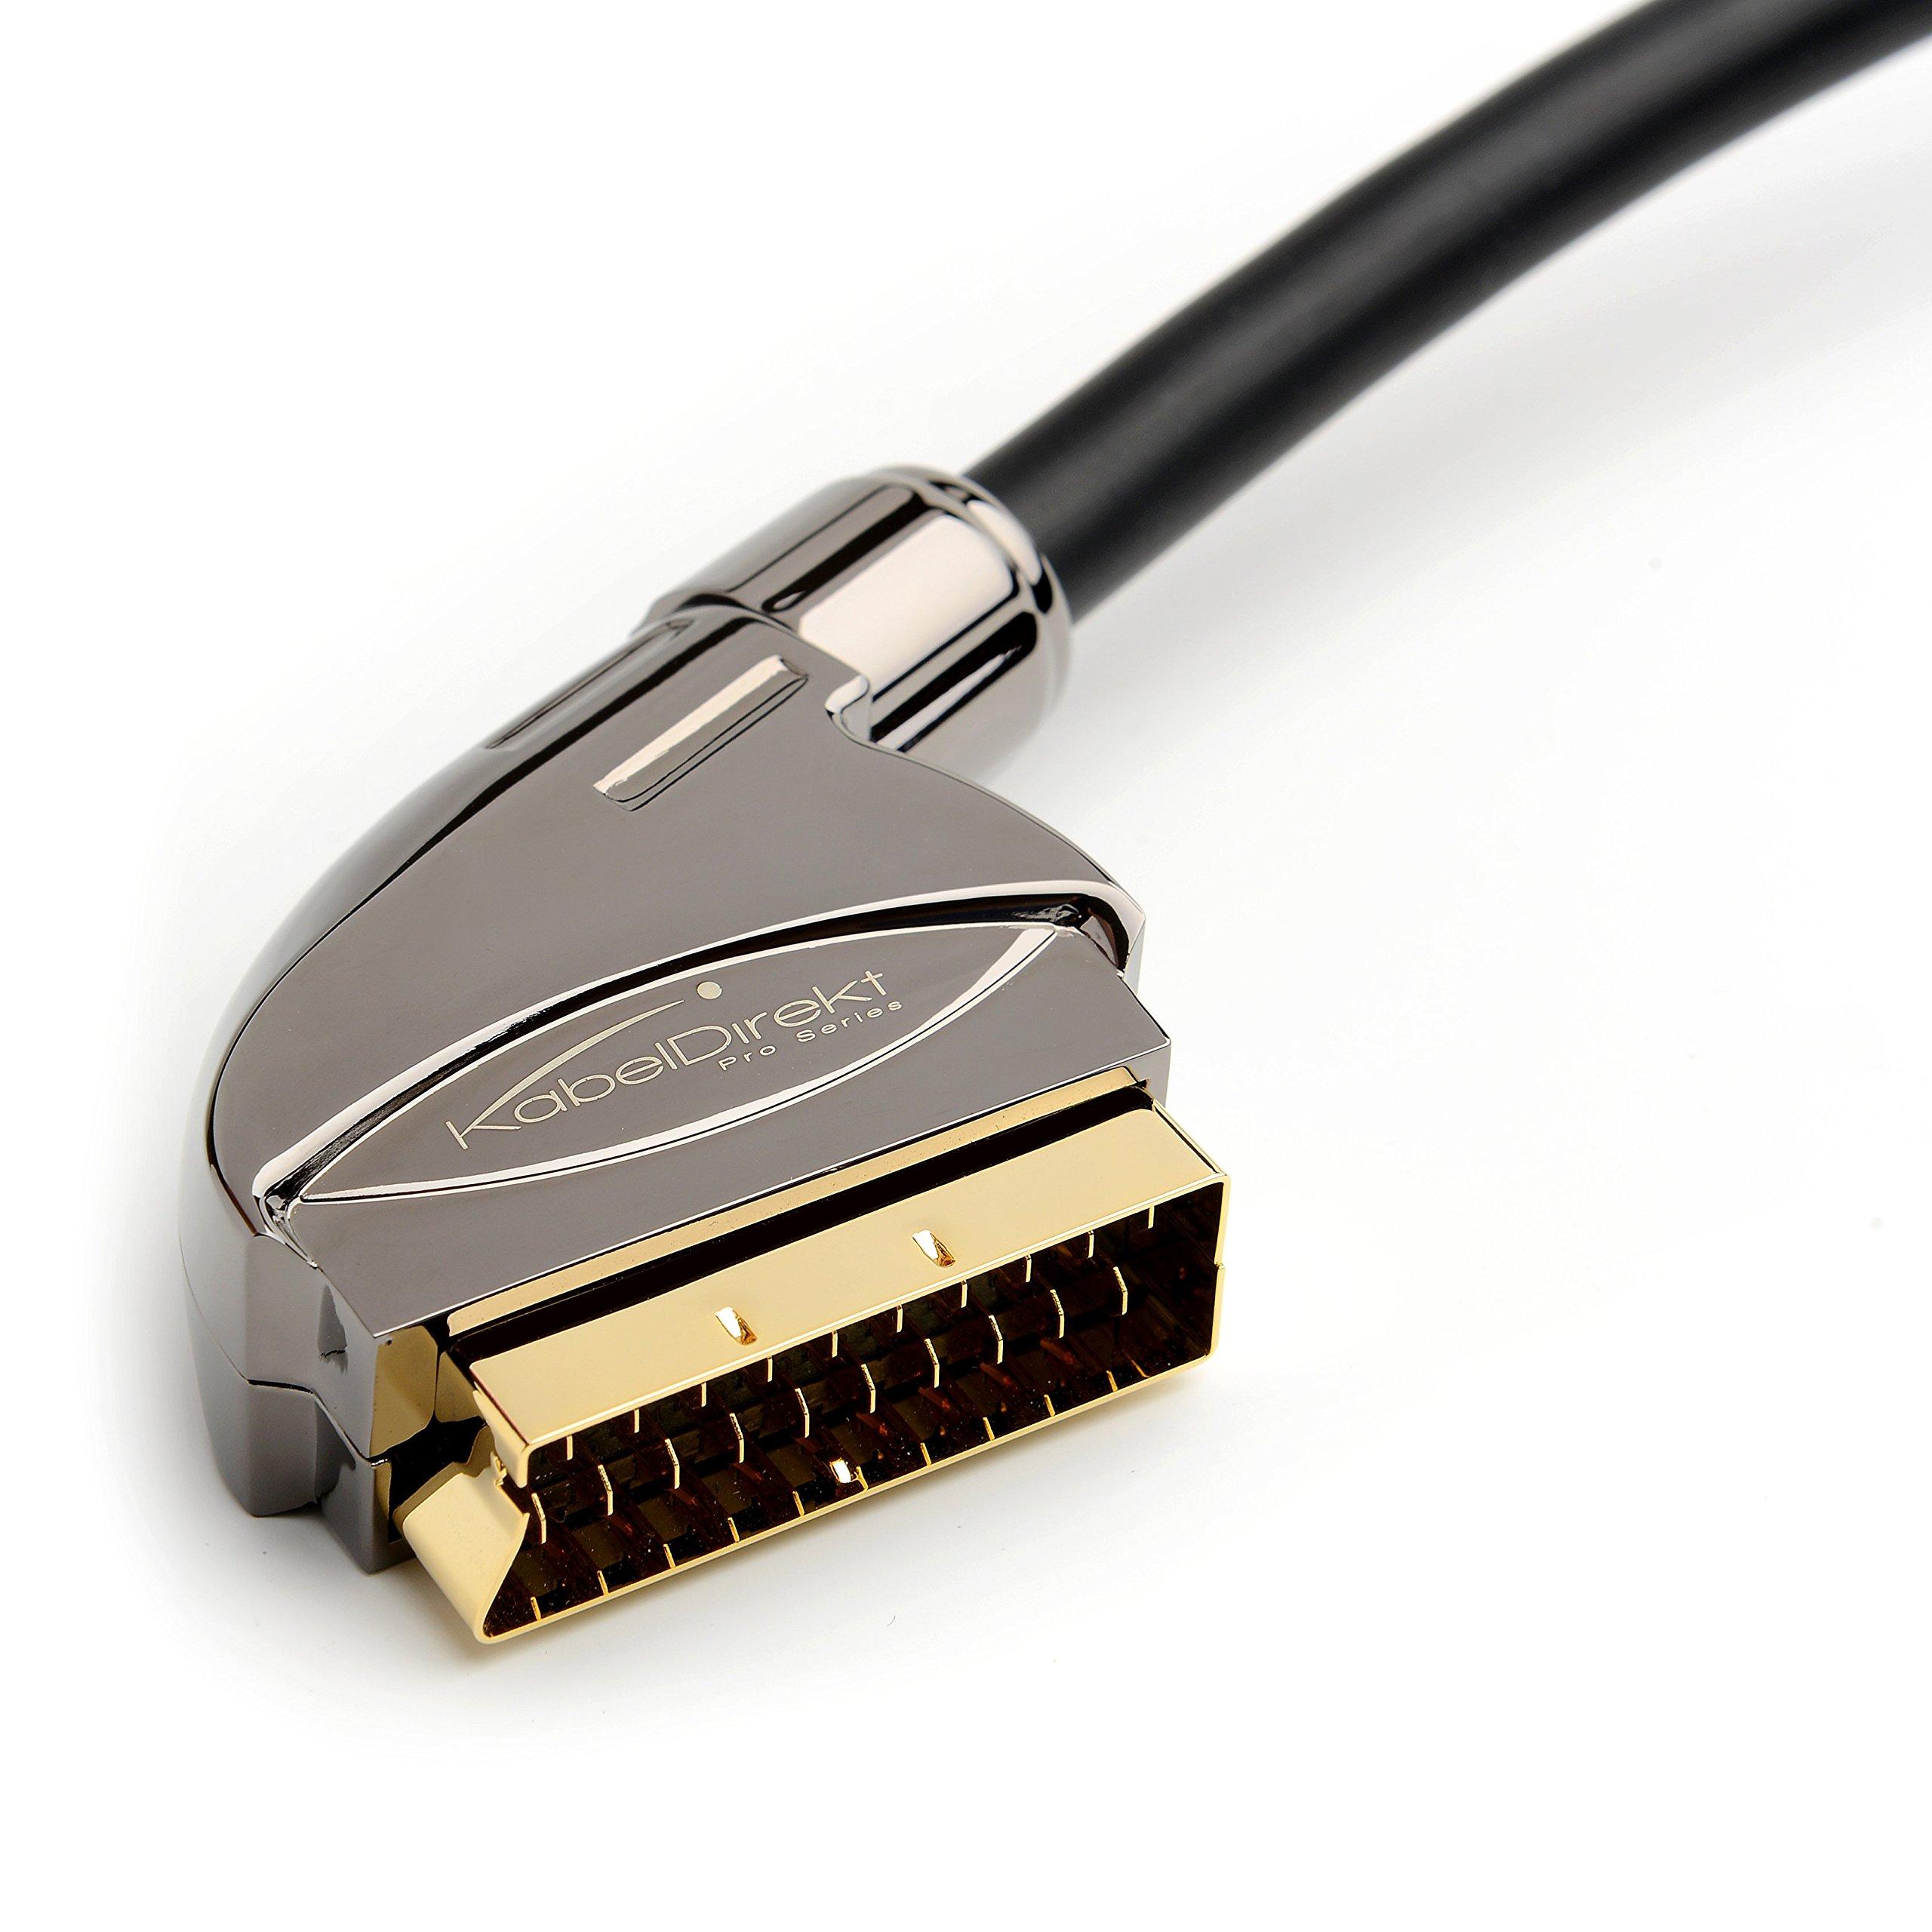 KabelDirekt 6 feet SCART Cable (21-Pin, Multiple Shieldings, Precision Connector, Full HD) - Pro Series by KabelDirekt